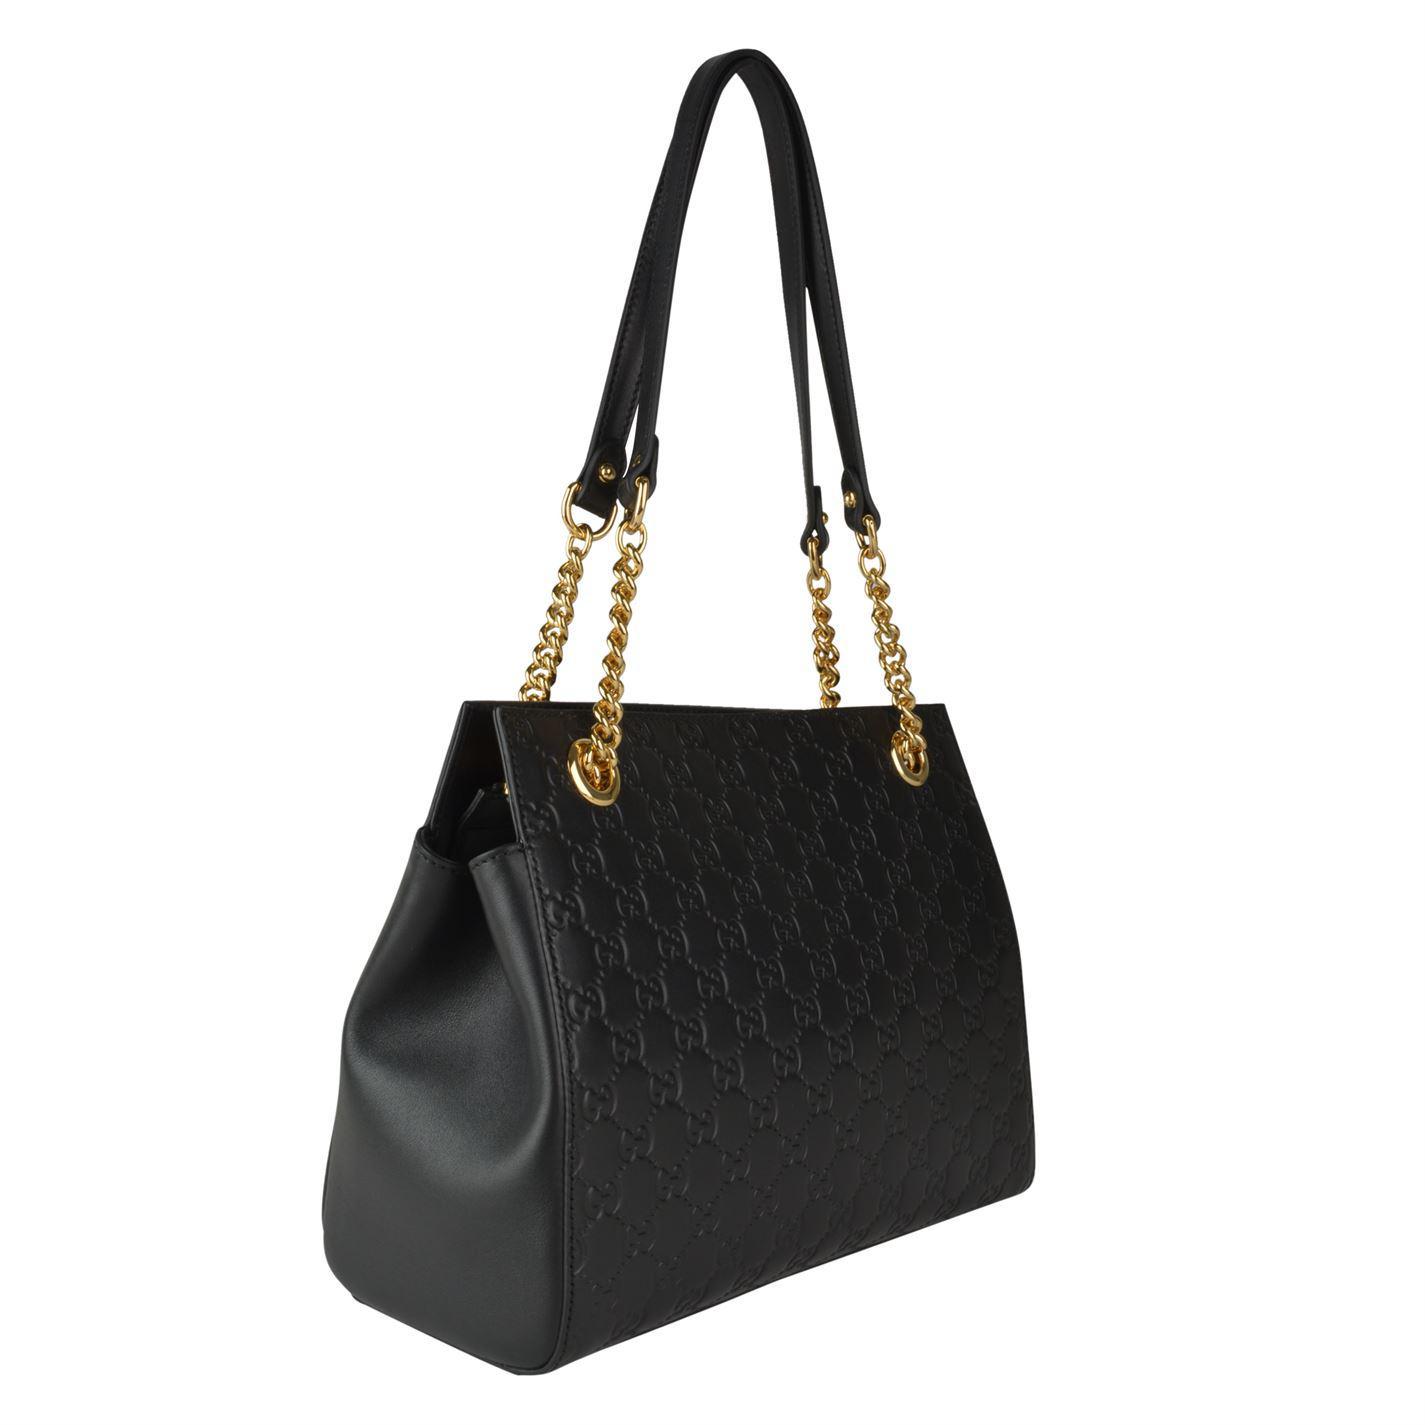 4f6f82a81 Gucci Signature Gg Print Bag in Black - Lyst